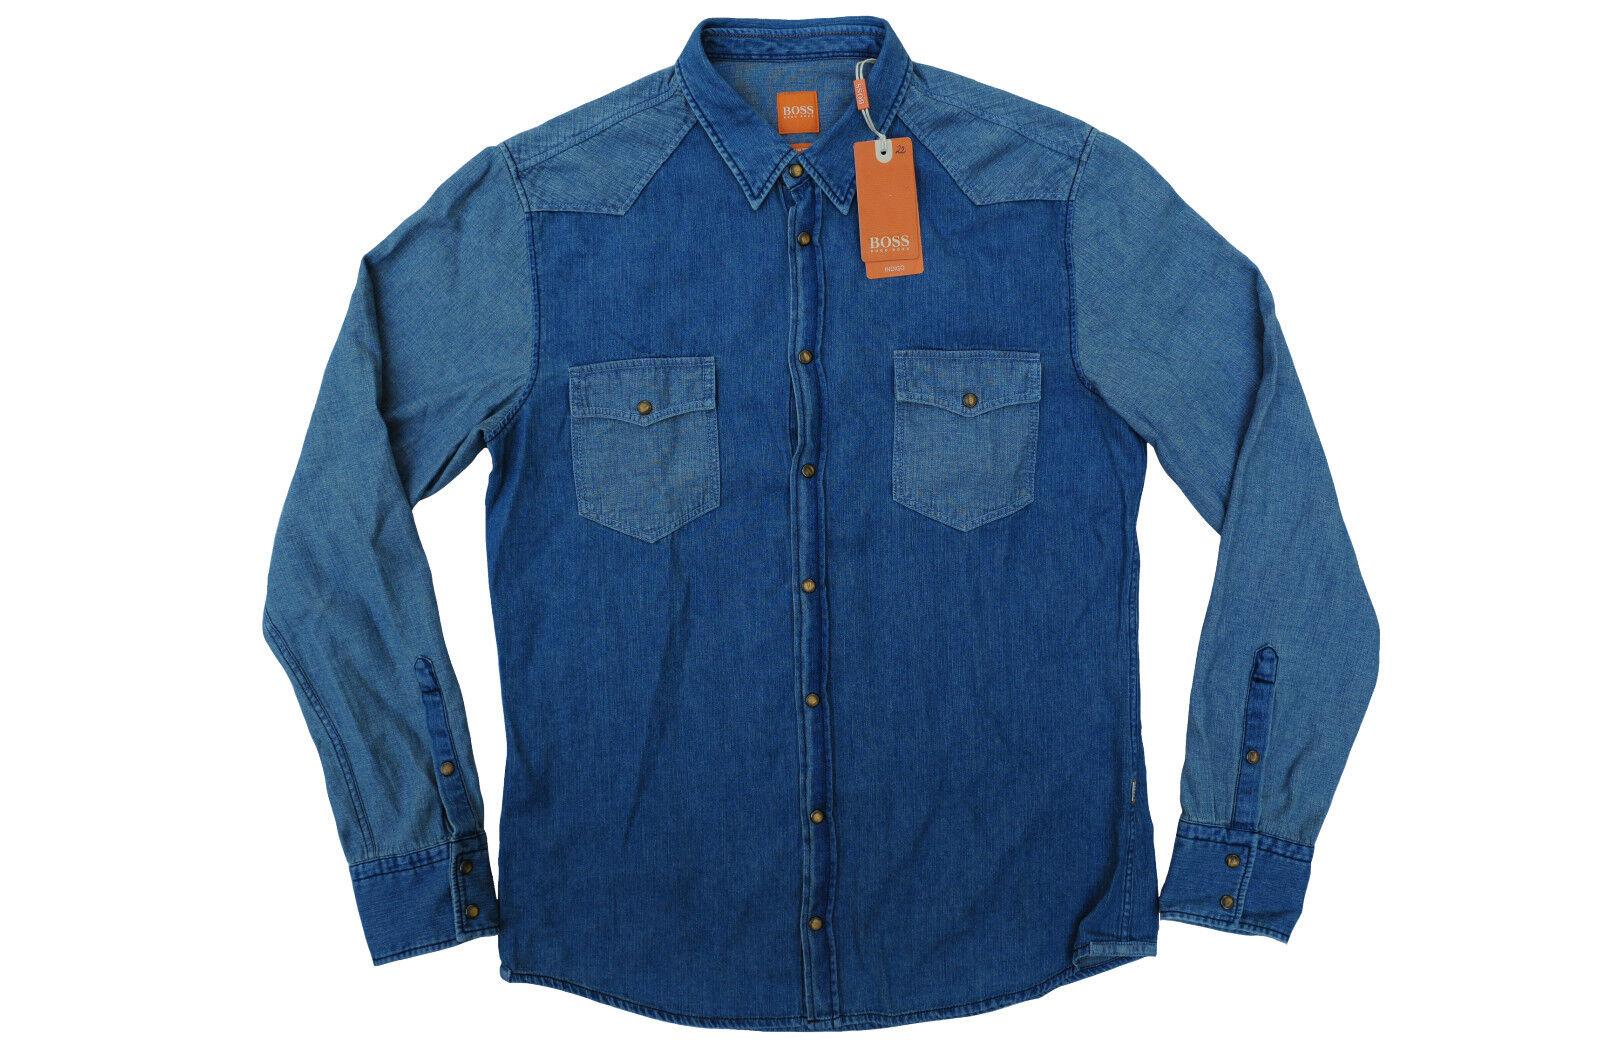 NEU gr. M HUGO BOSS orange HEMD JERODEO SLIM FIT DARK-blueE zu Jeans 50377902